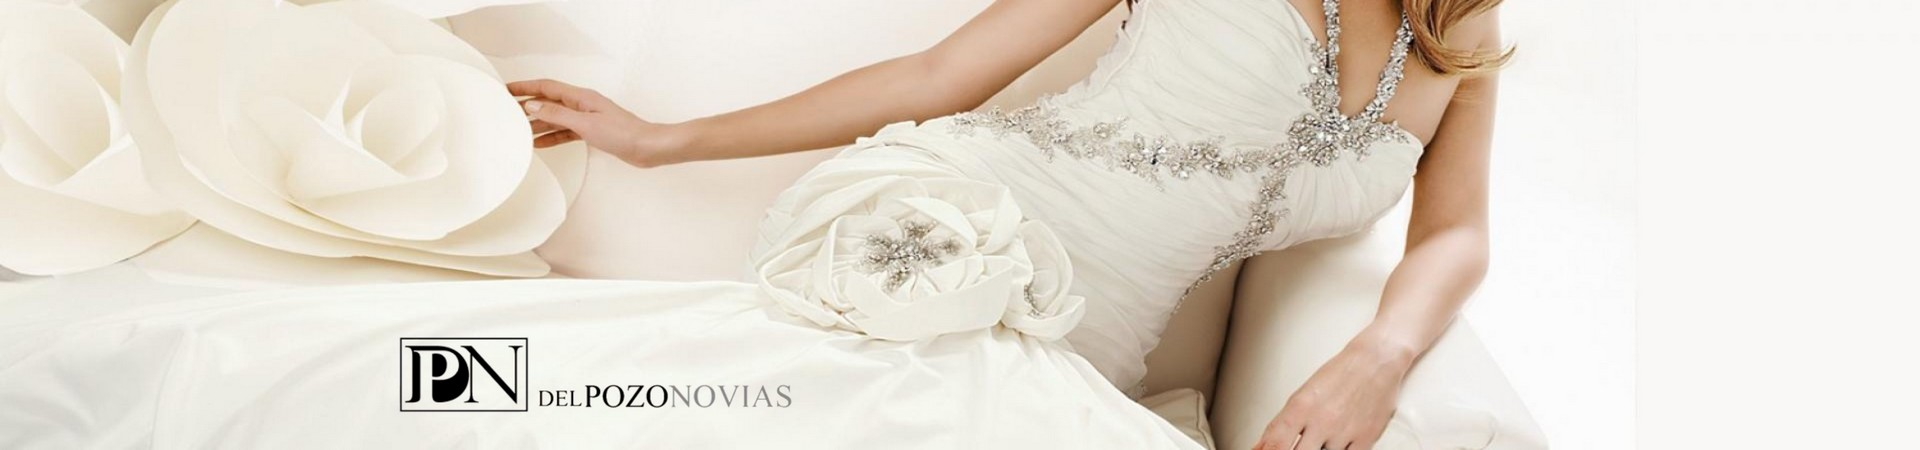 vestidos de novia en don benito, trajes de novia en don benito